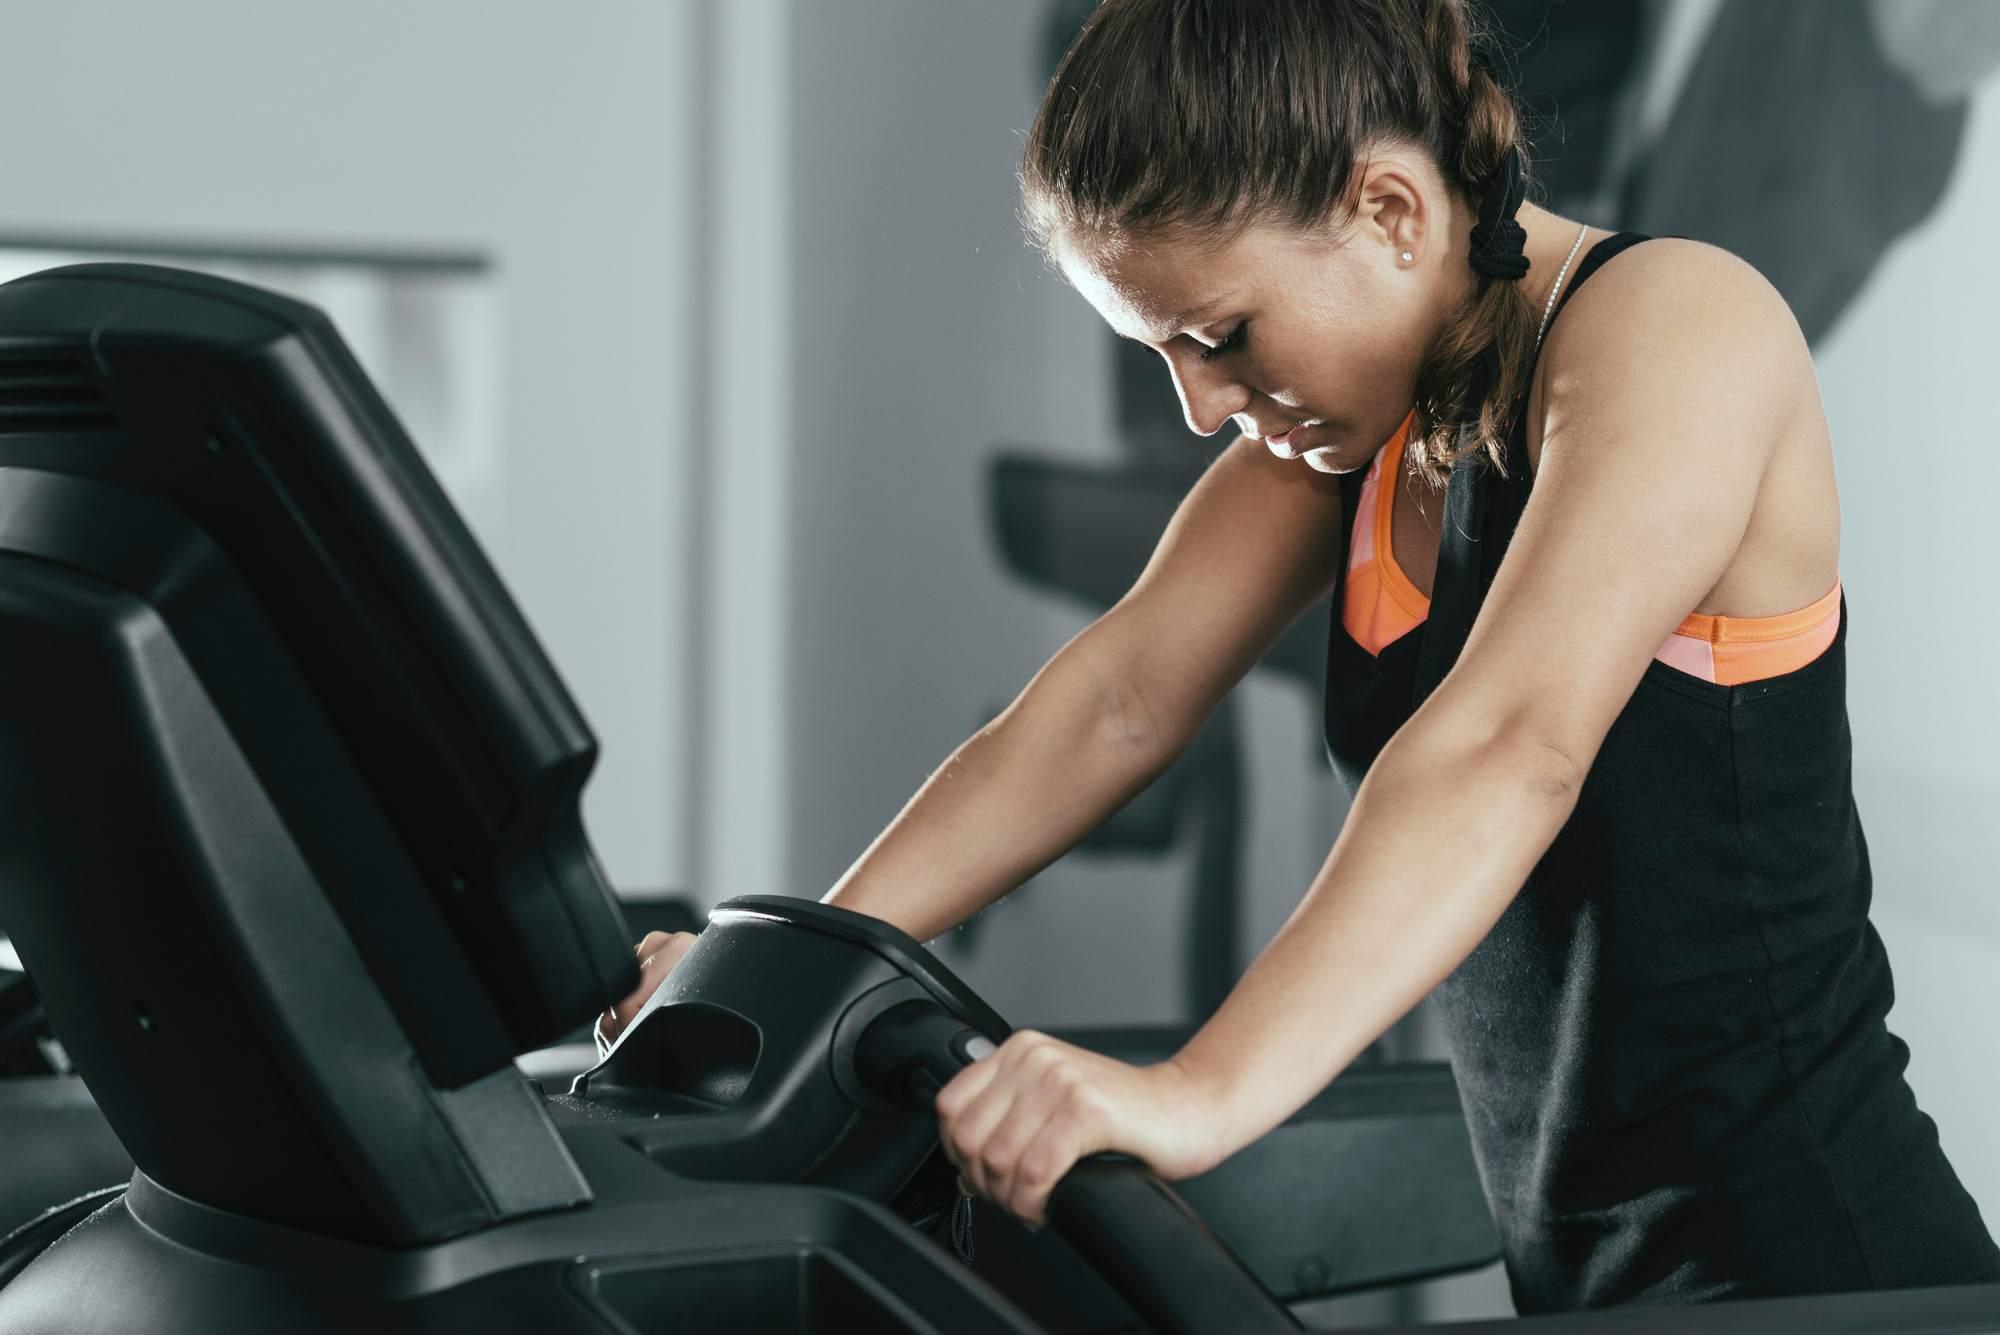 d050194e9 10 Treadmill Walking Mistakes to Avoid